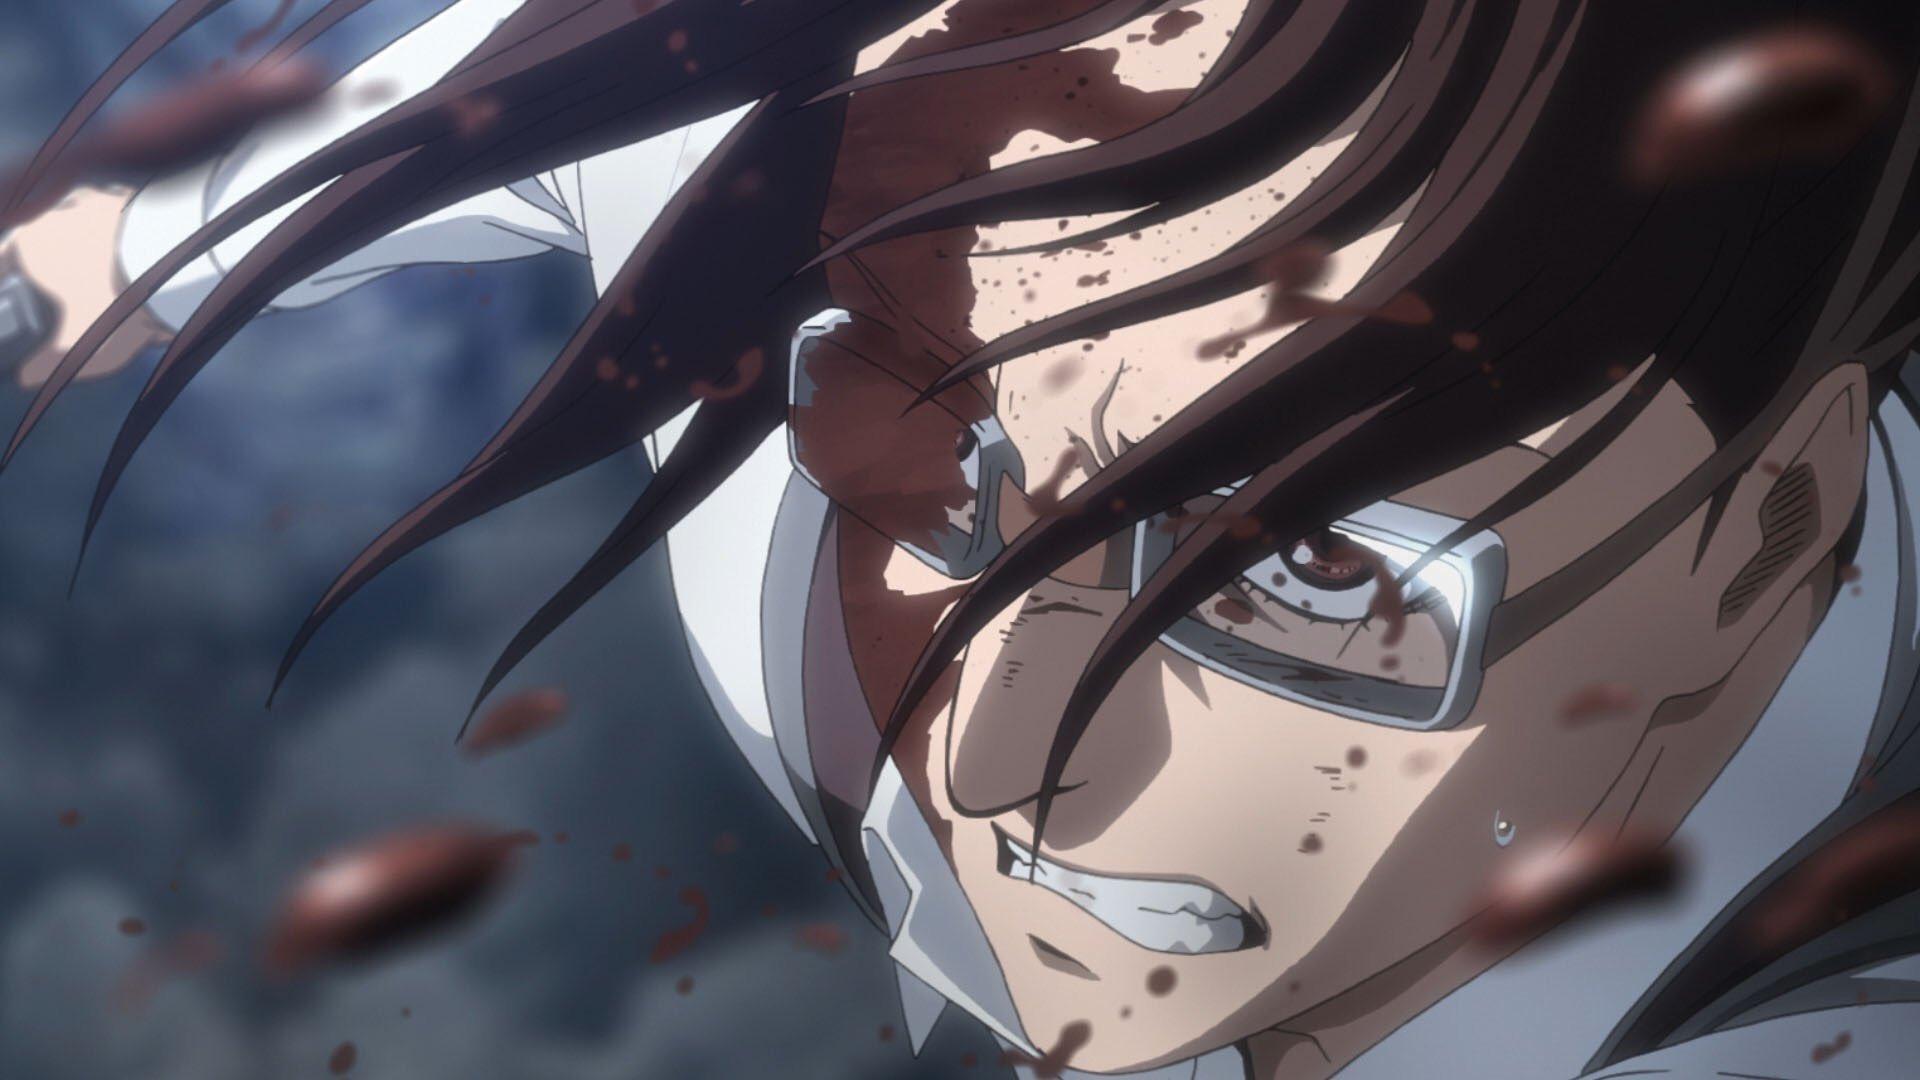 Fakta Yang Terungkap Di Shingeki No Kyojin Season 4 Kampung Snk